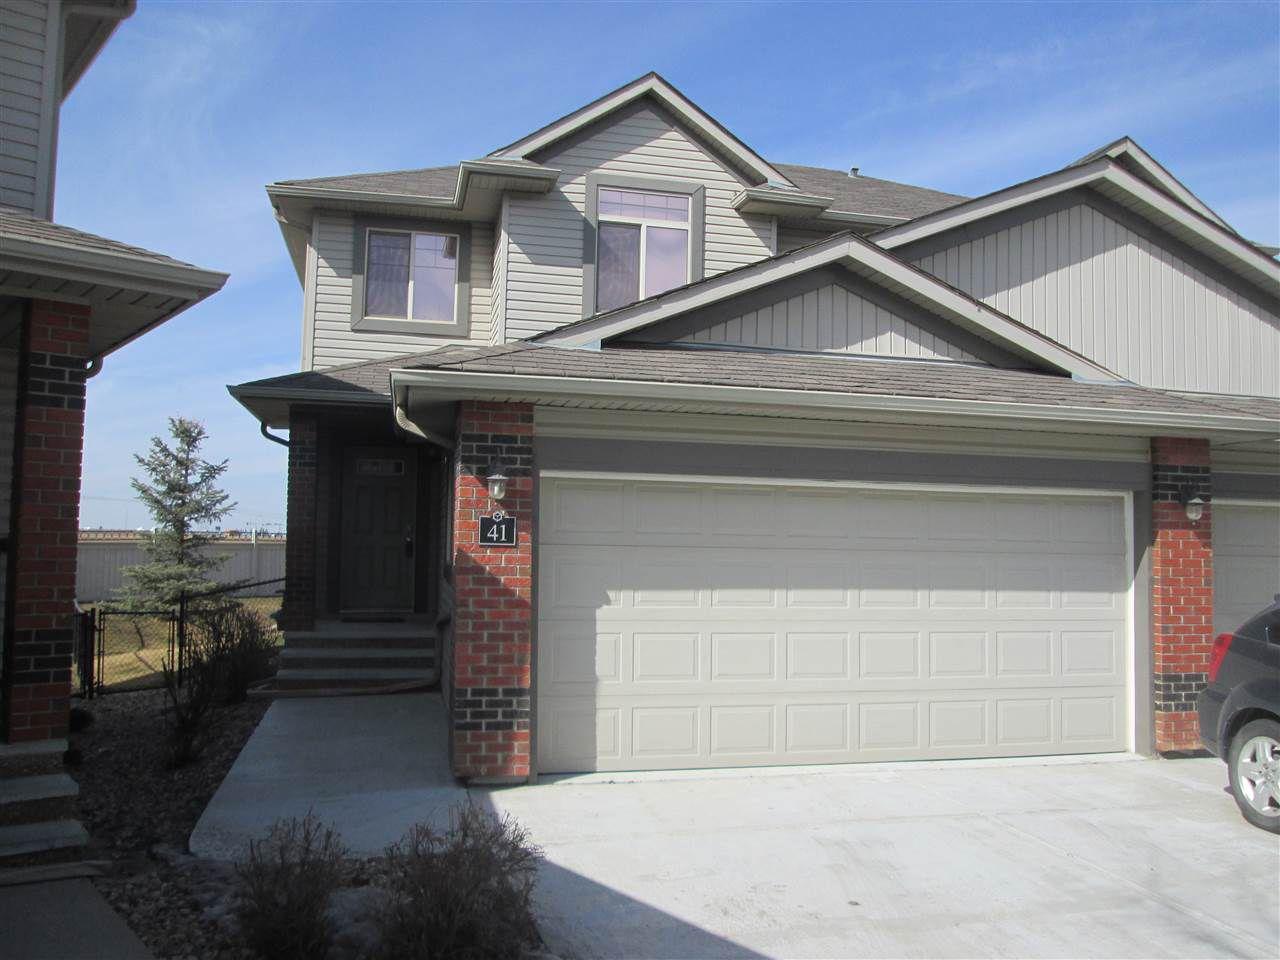 Main Photo: 41 1128 156 Street in Edmonton: Zone 14 House Half Duplex for sale : MLS®# E4150860